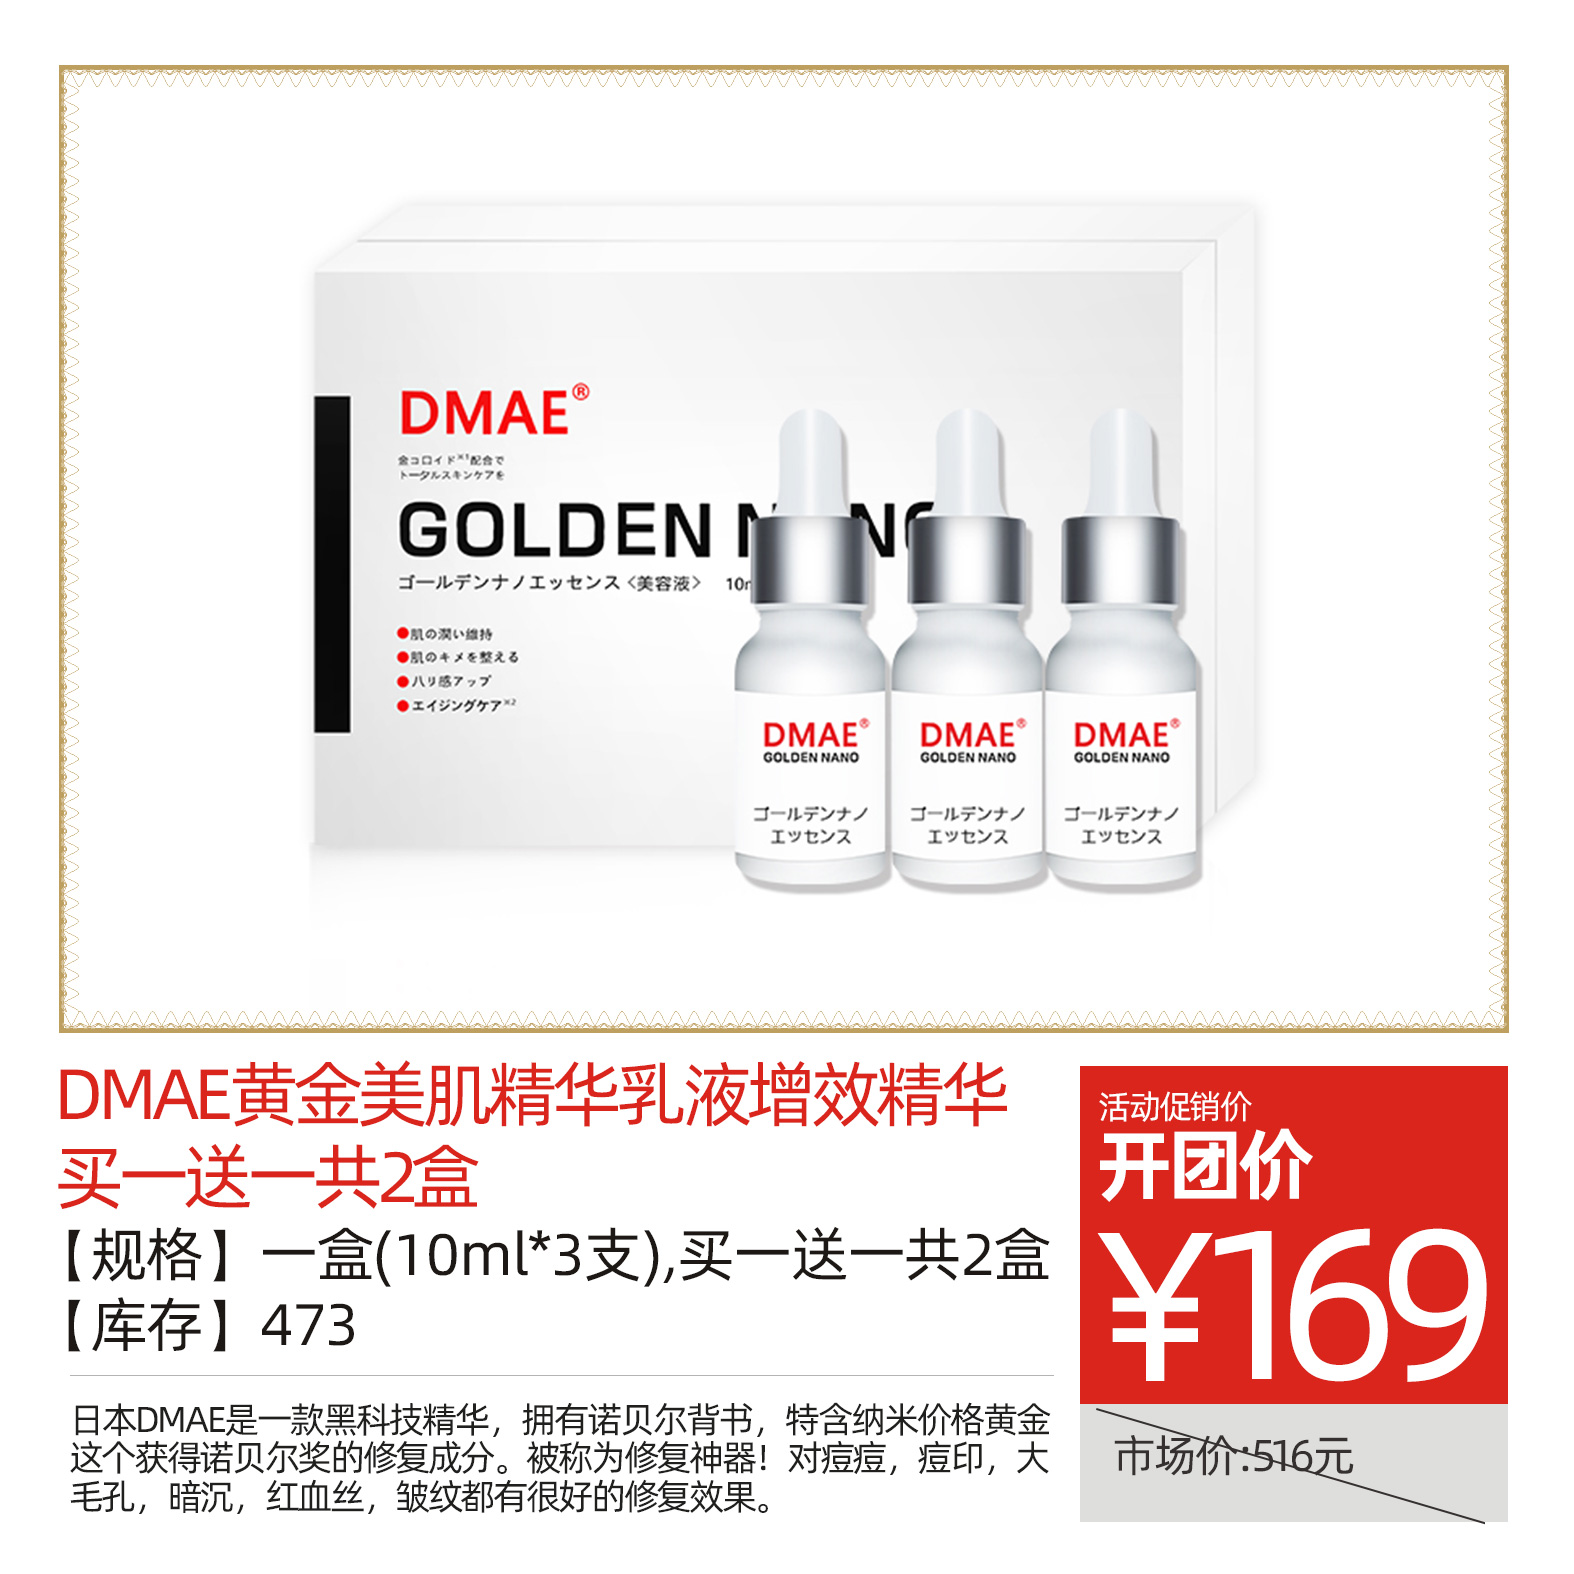 DMAE黄金美肌精华乳液增效精华 买一送一共2盒